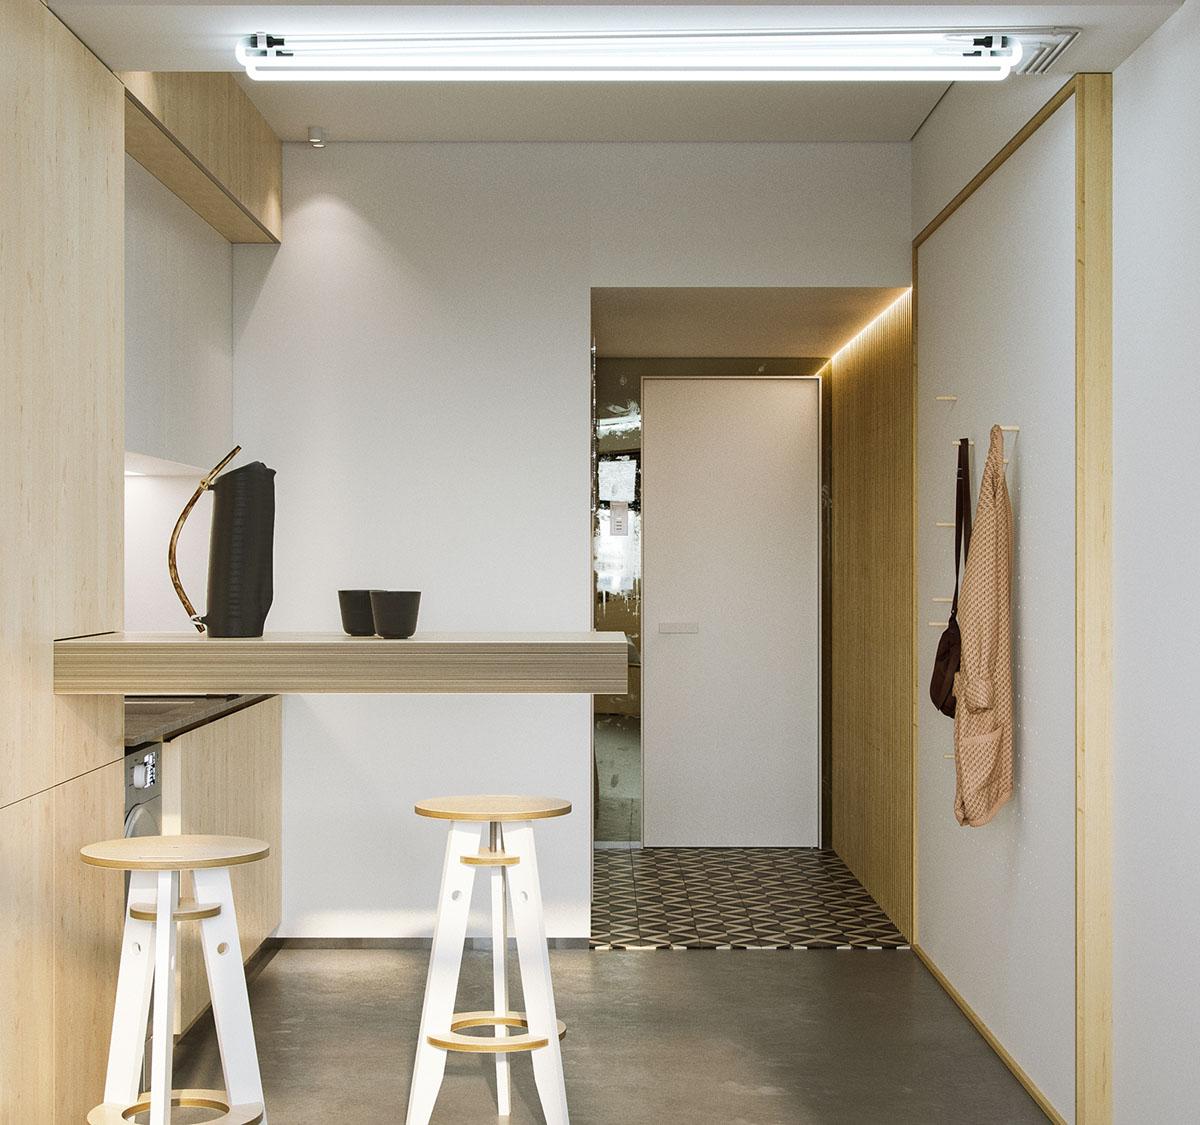 23 Square Living Room Designs Decorating Ideas: Super Compact Spaces: A Minimalist Studio Apartment Under